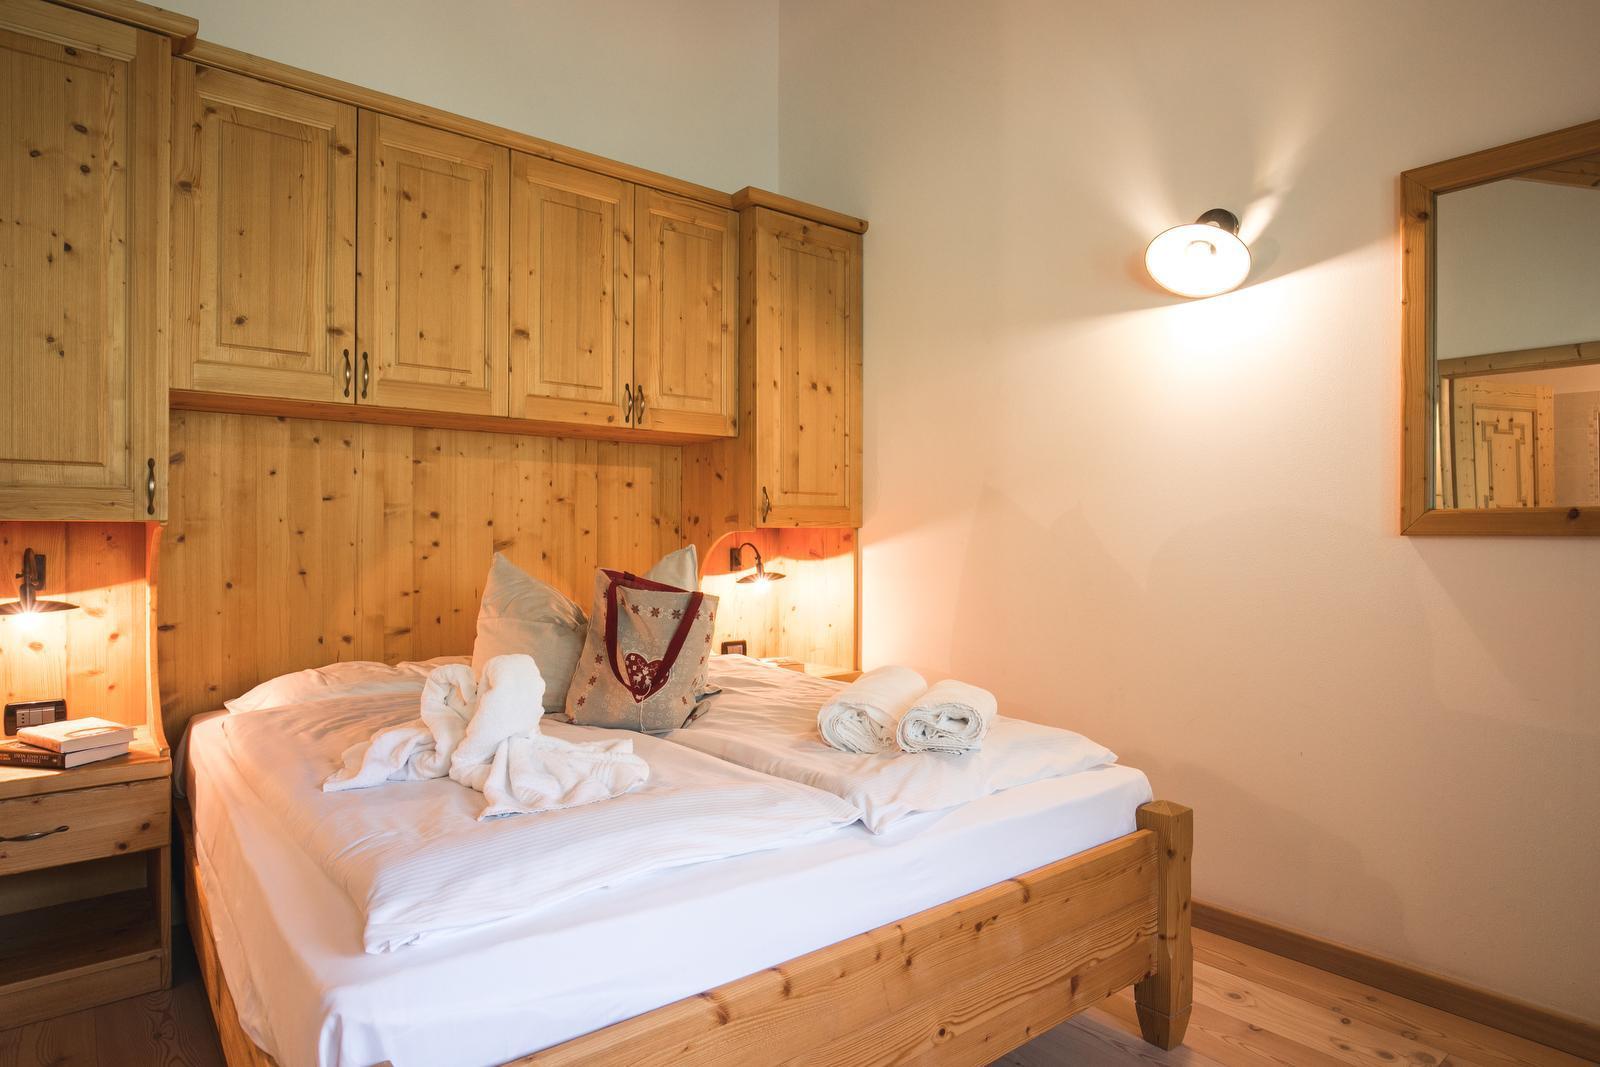 hotel bio in trentino altoadige, Chalet Alpenrose